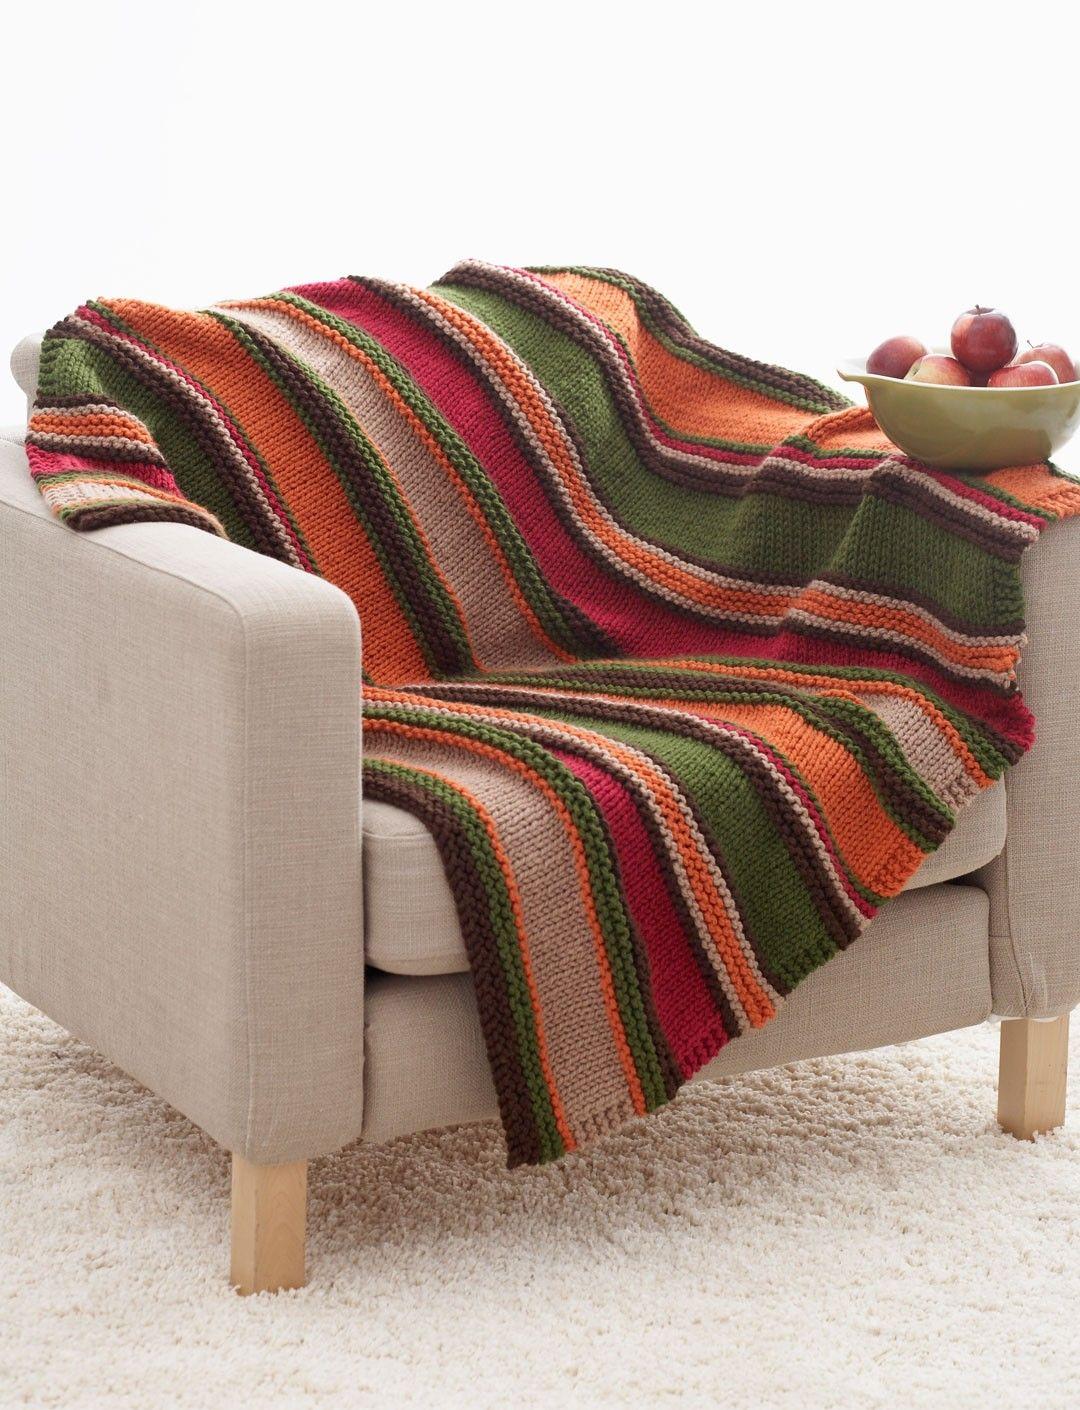 Yarnspirations.com - Bernat Basic Stripes Blanket - Patterns ...